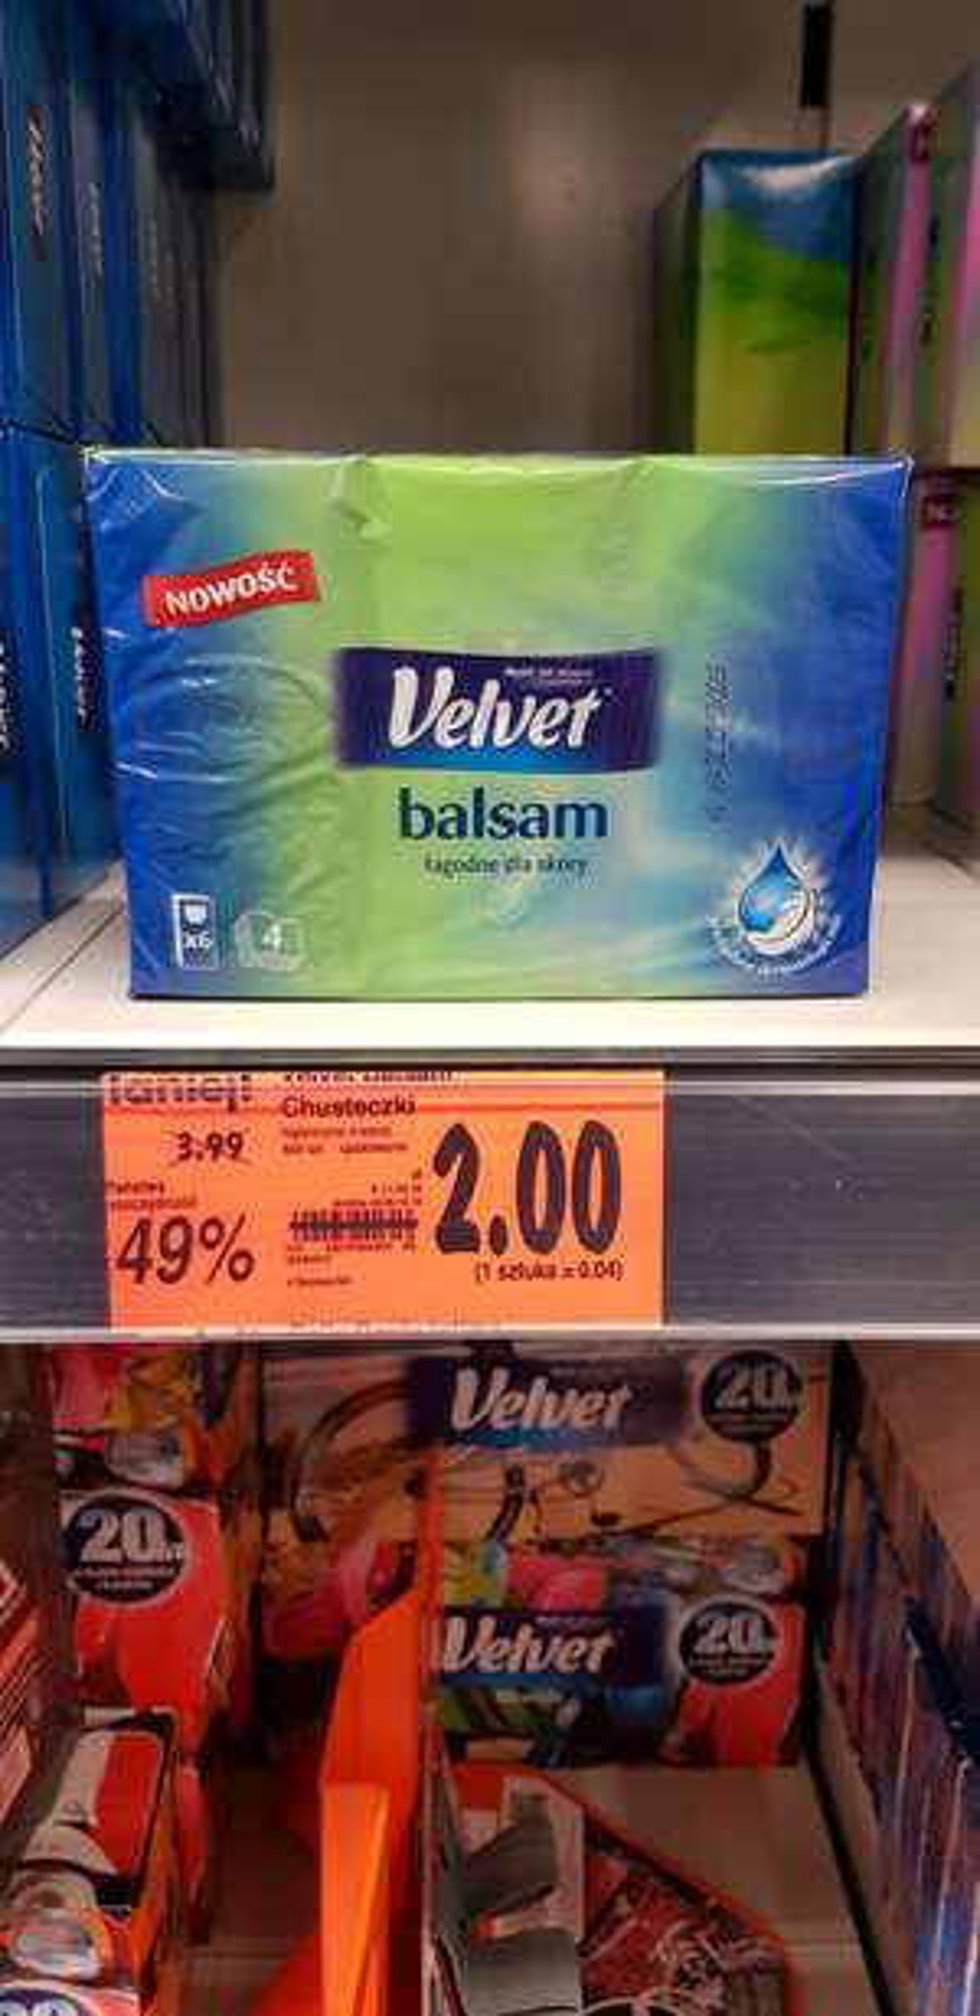 Chusteczki Velvet Balsam 6x9 szt. (Kaufland)